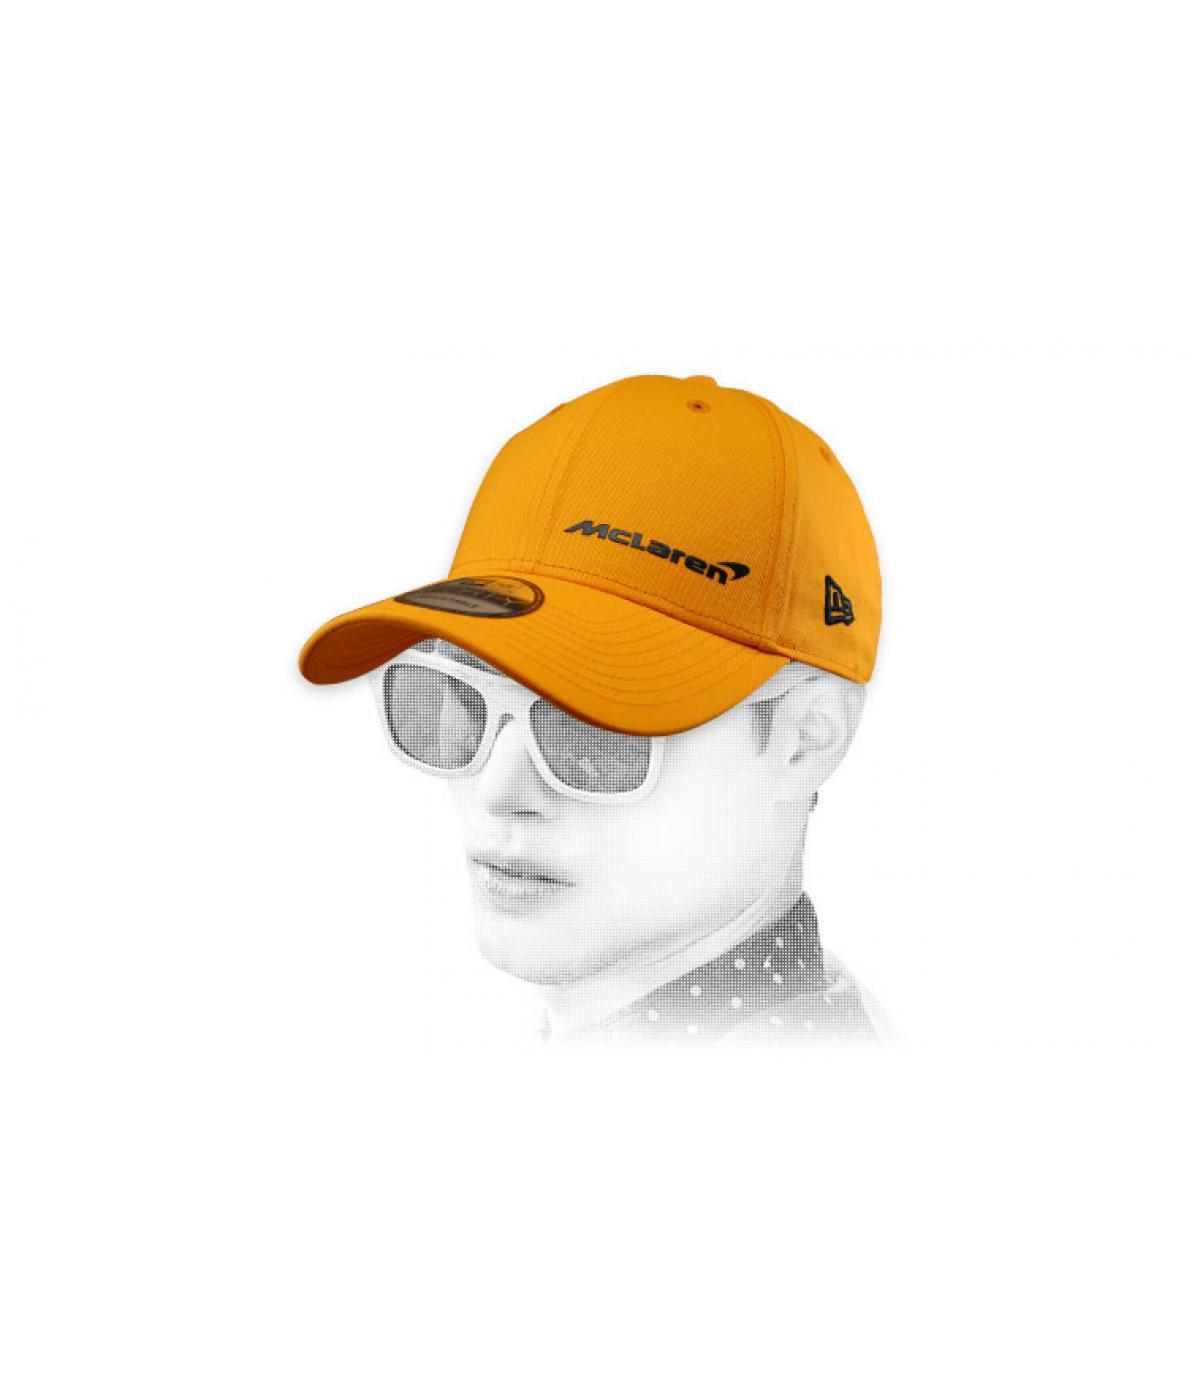 Cap McLaren gelb